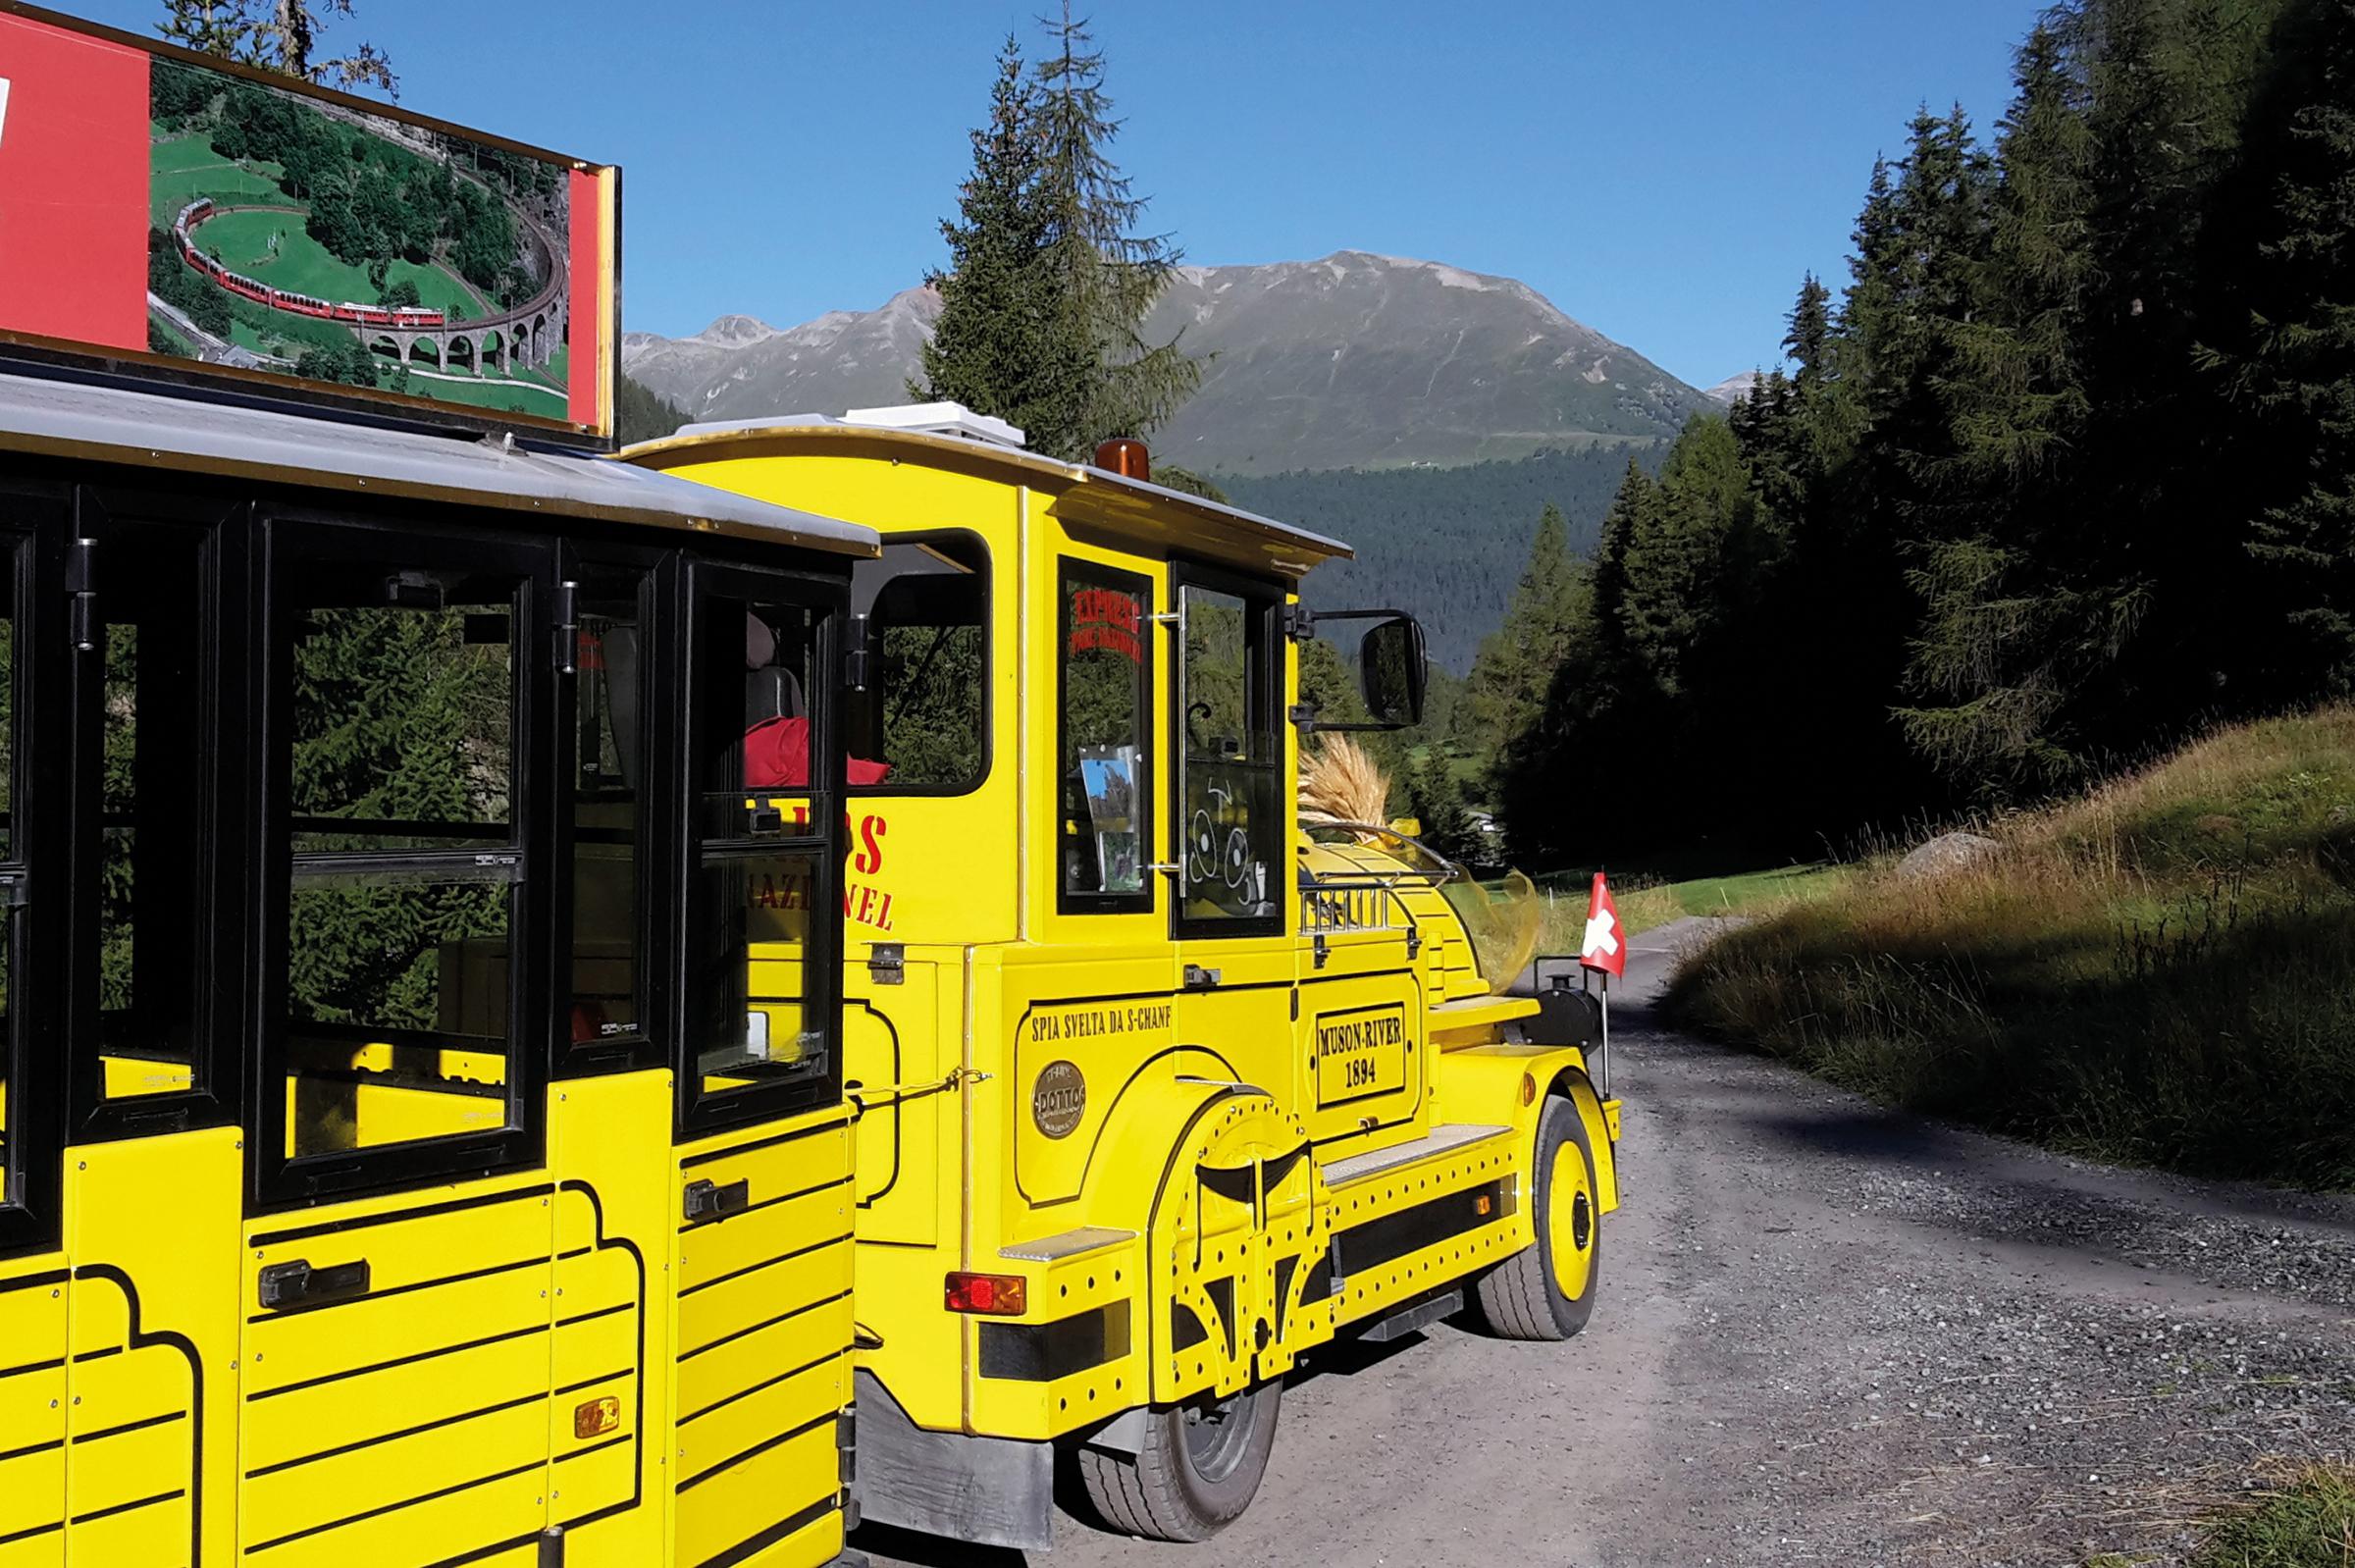 Nationalpark Bummelzug